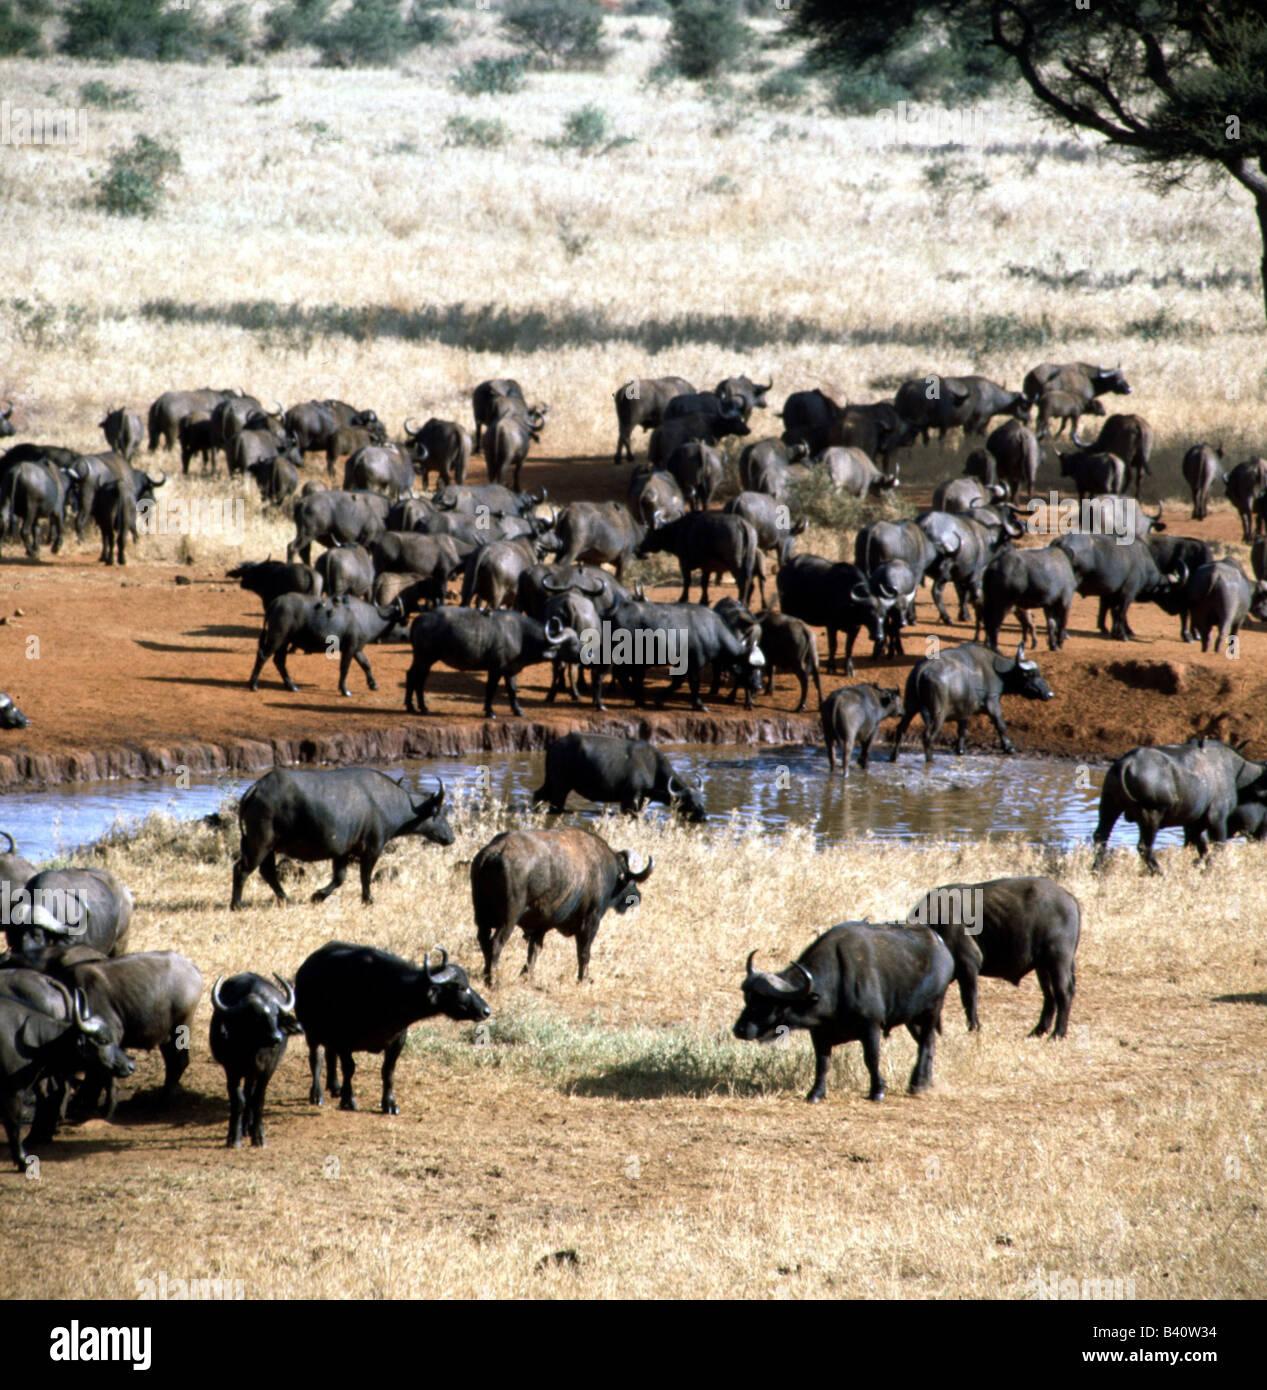 Zoologie / Tiere, Säugetier / Säugetier, Horntiere, afrikanische ...